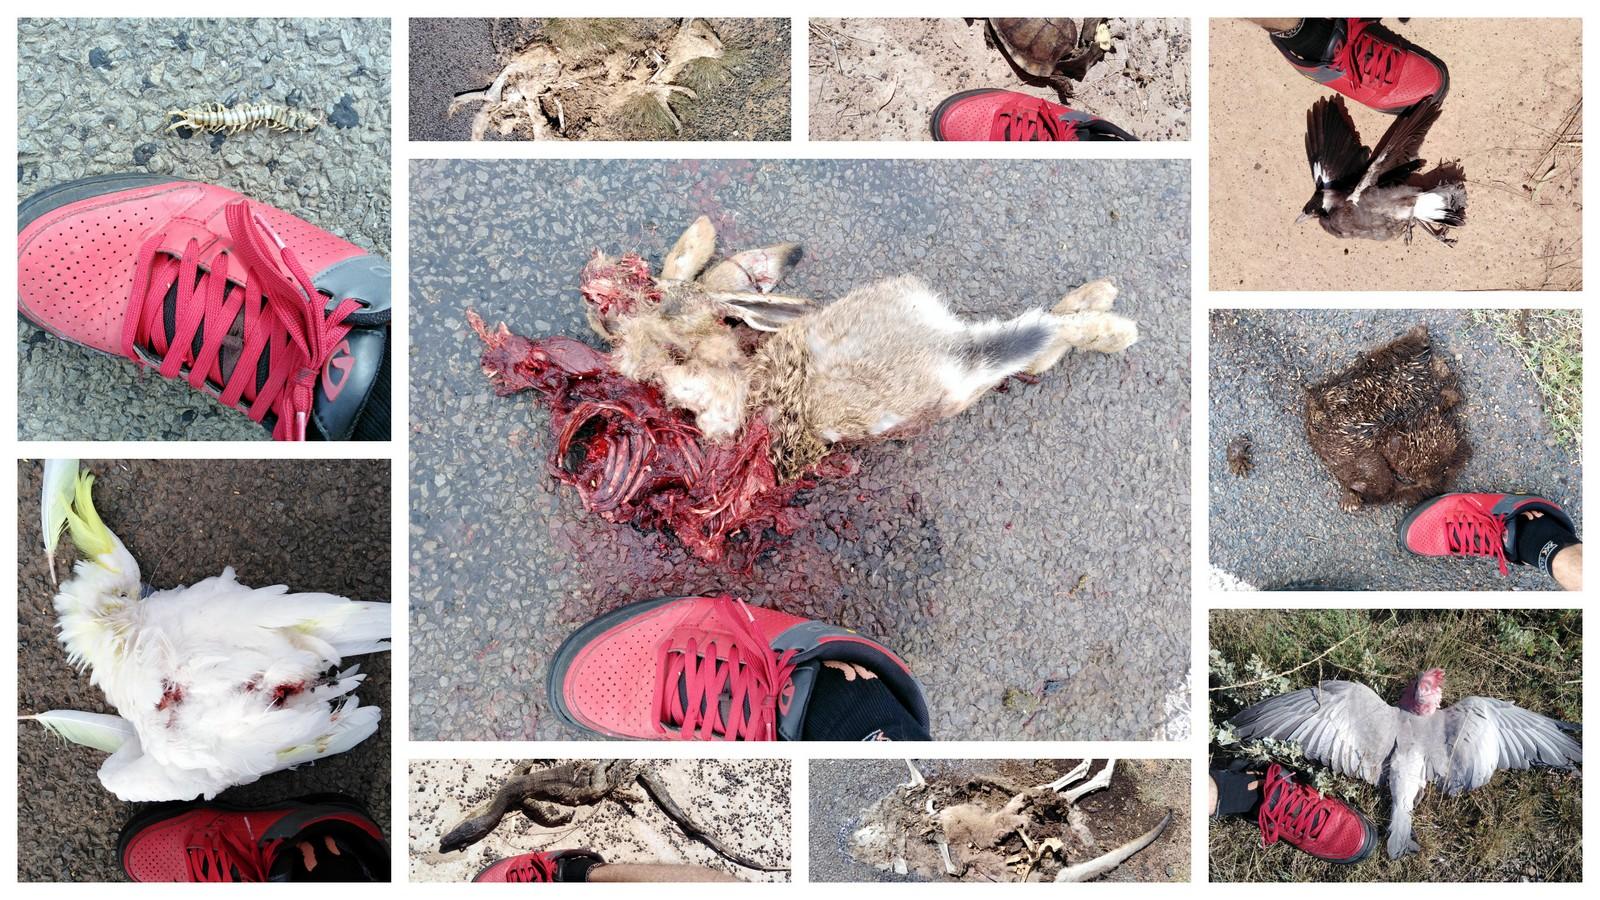 Roadkill on road from Narrabri to Wee Waa, NSW